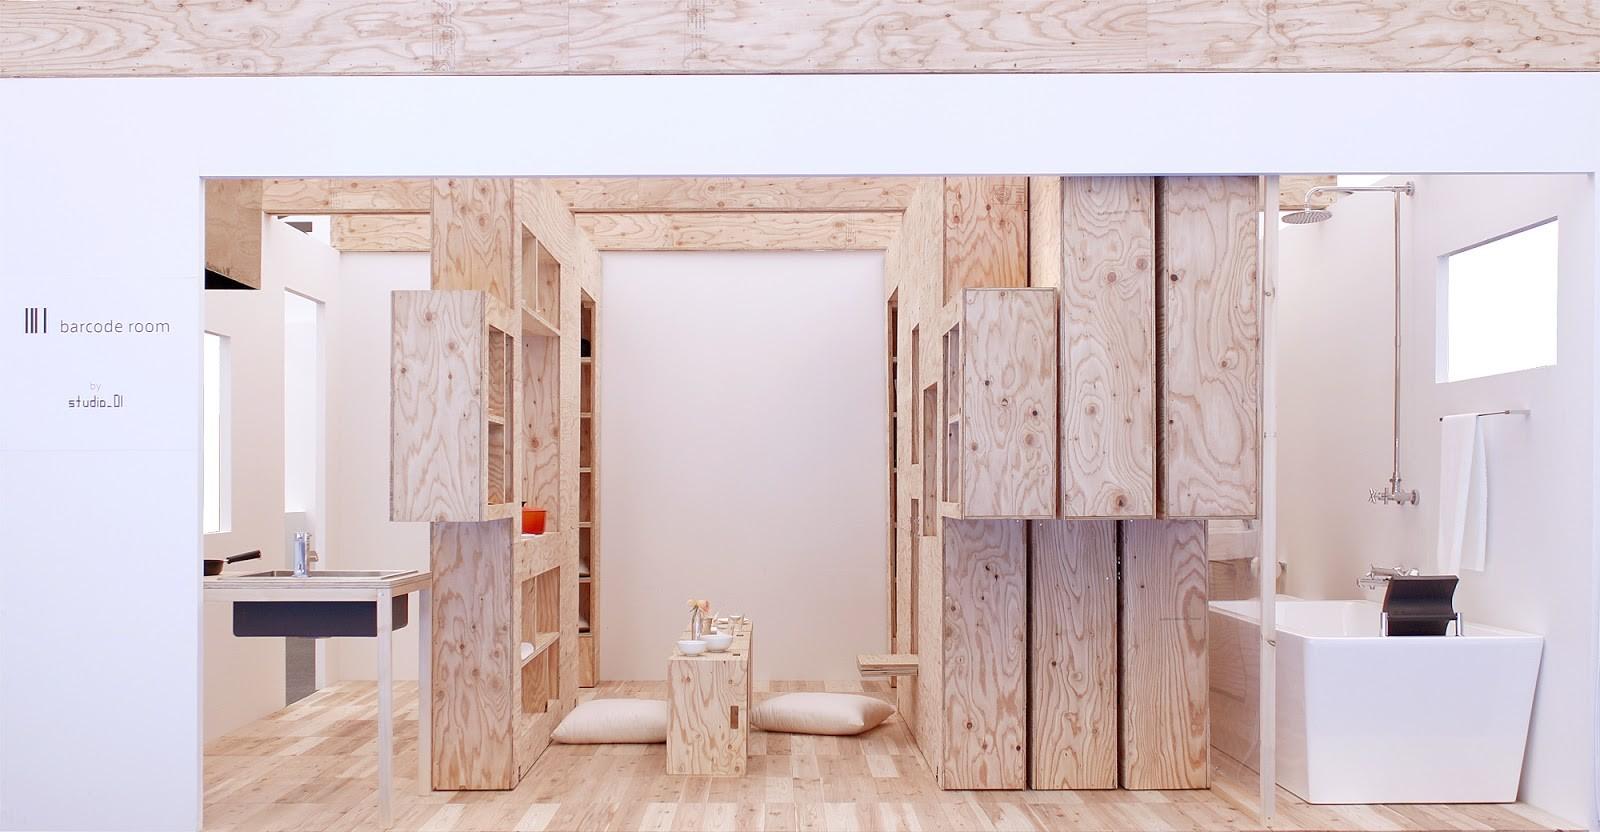 Tiny house tag plataforma arquitectura for Espacios minimos arquitectura